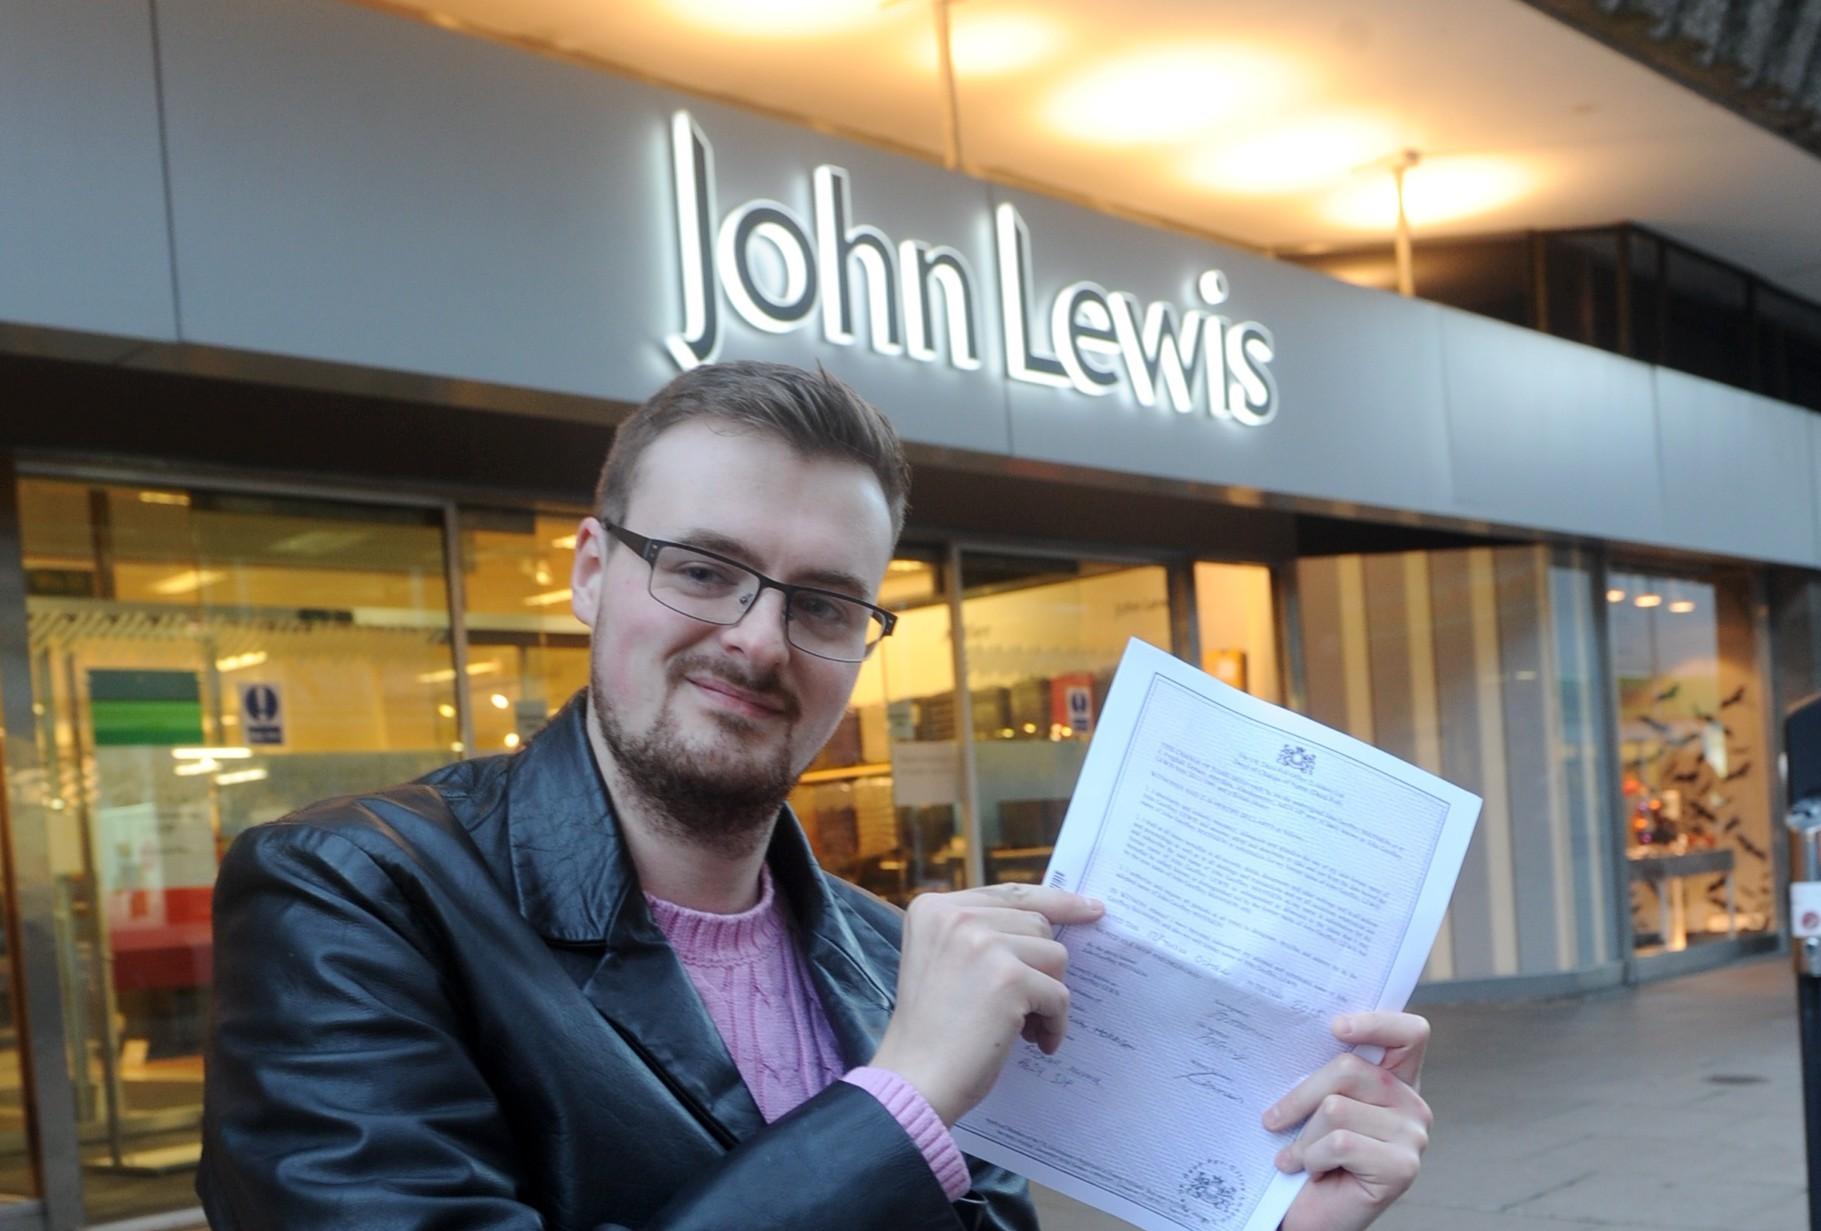 John Mannion, formerly John Lewis